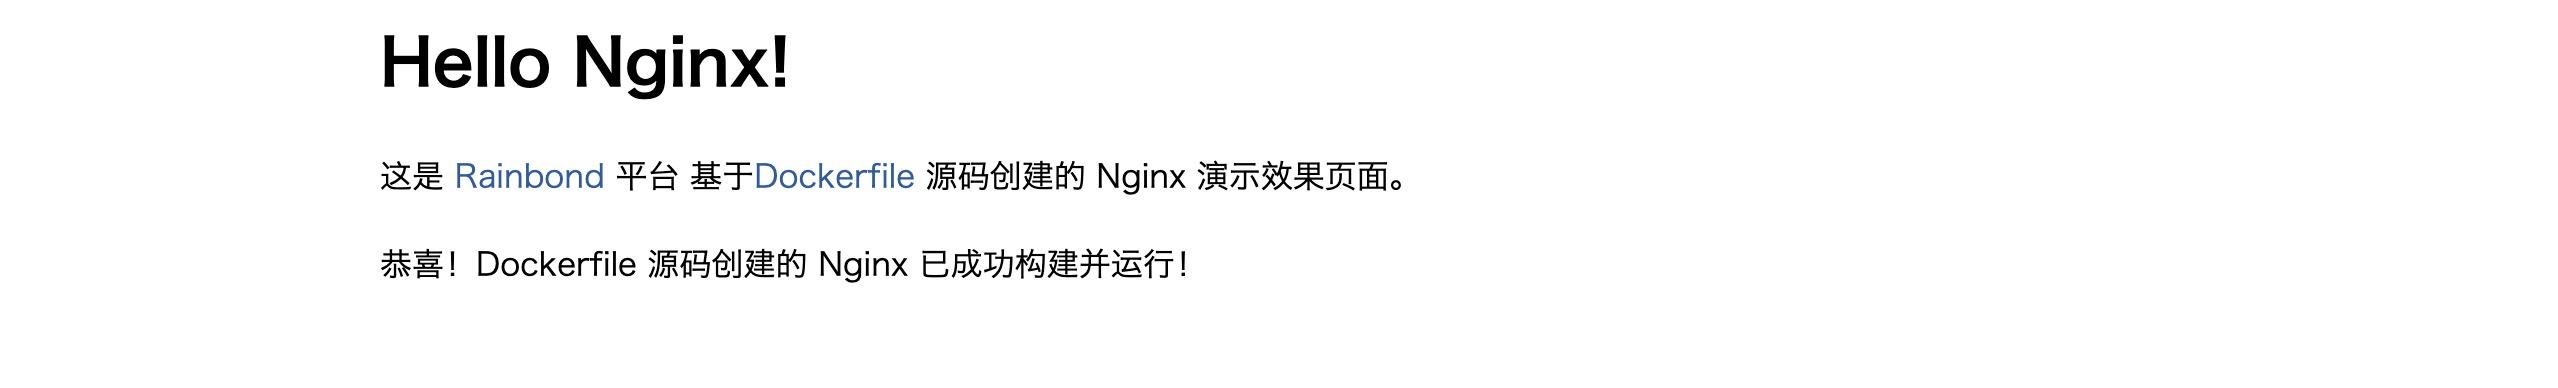 nginx-page